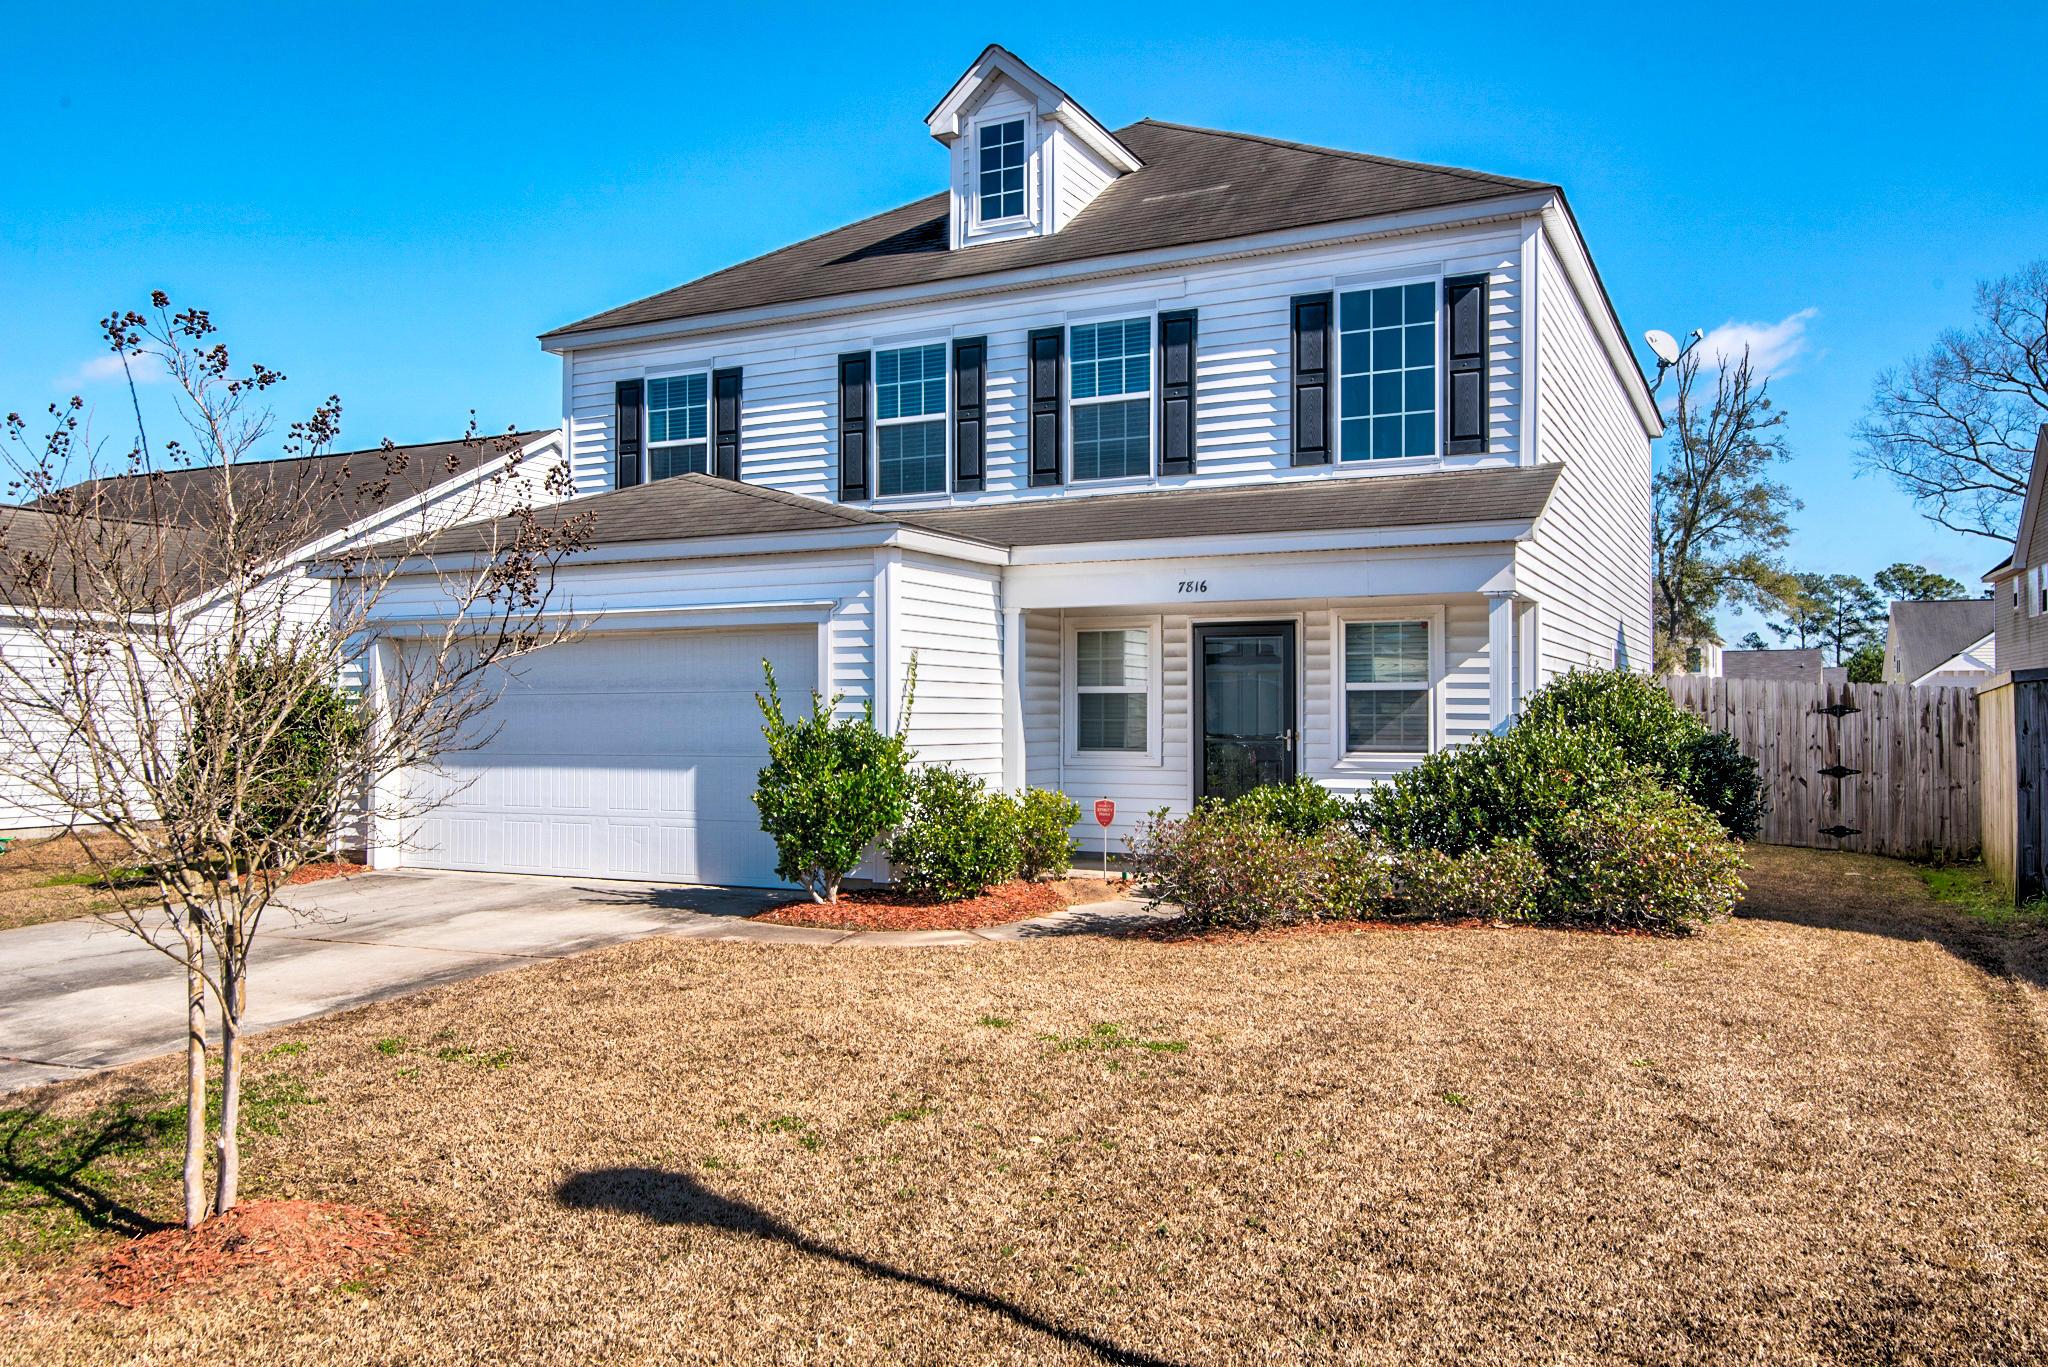 7816 Jean Rebault Drive North Charleston, SC 29420